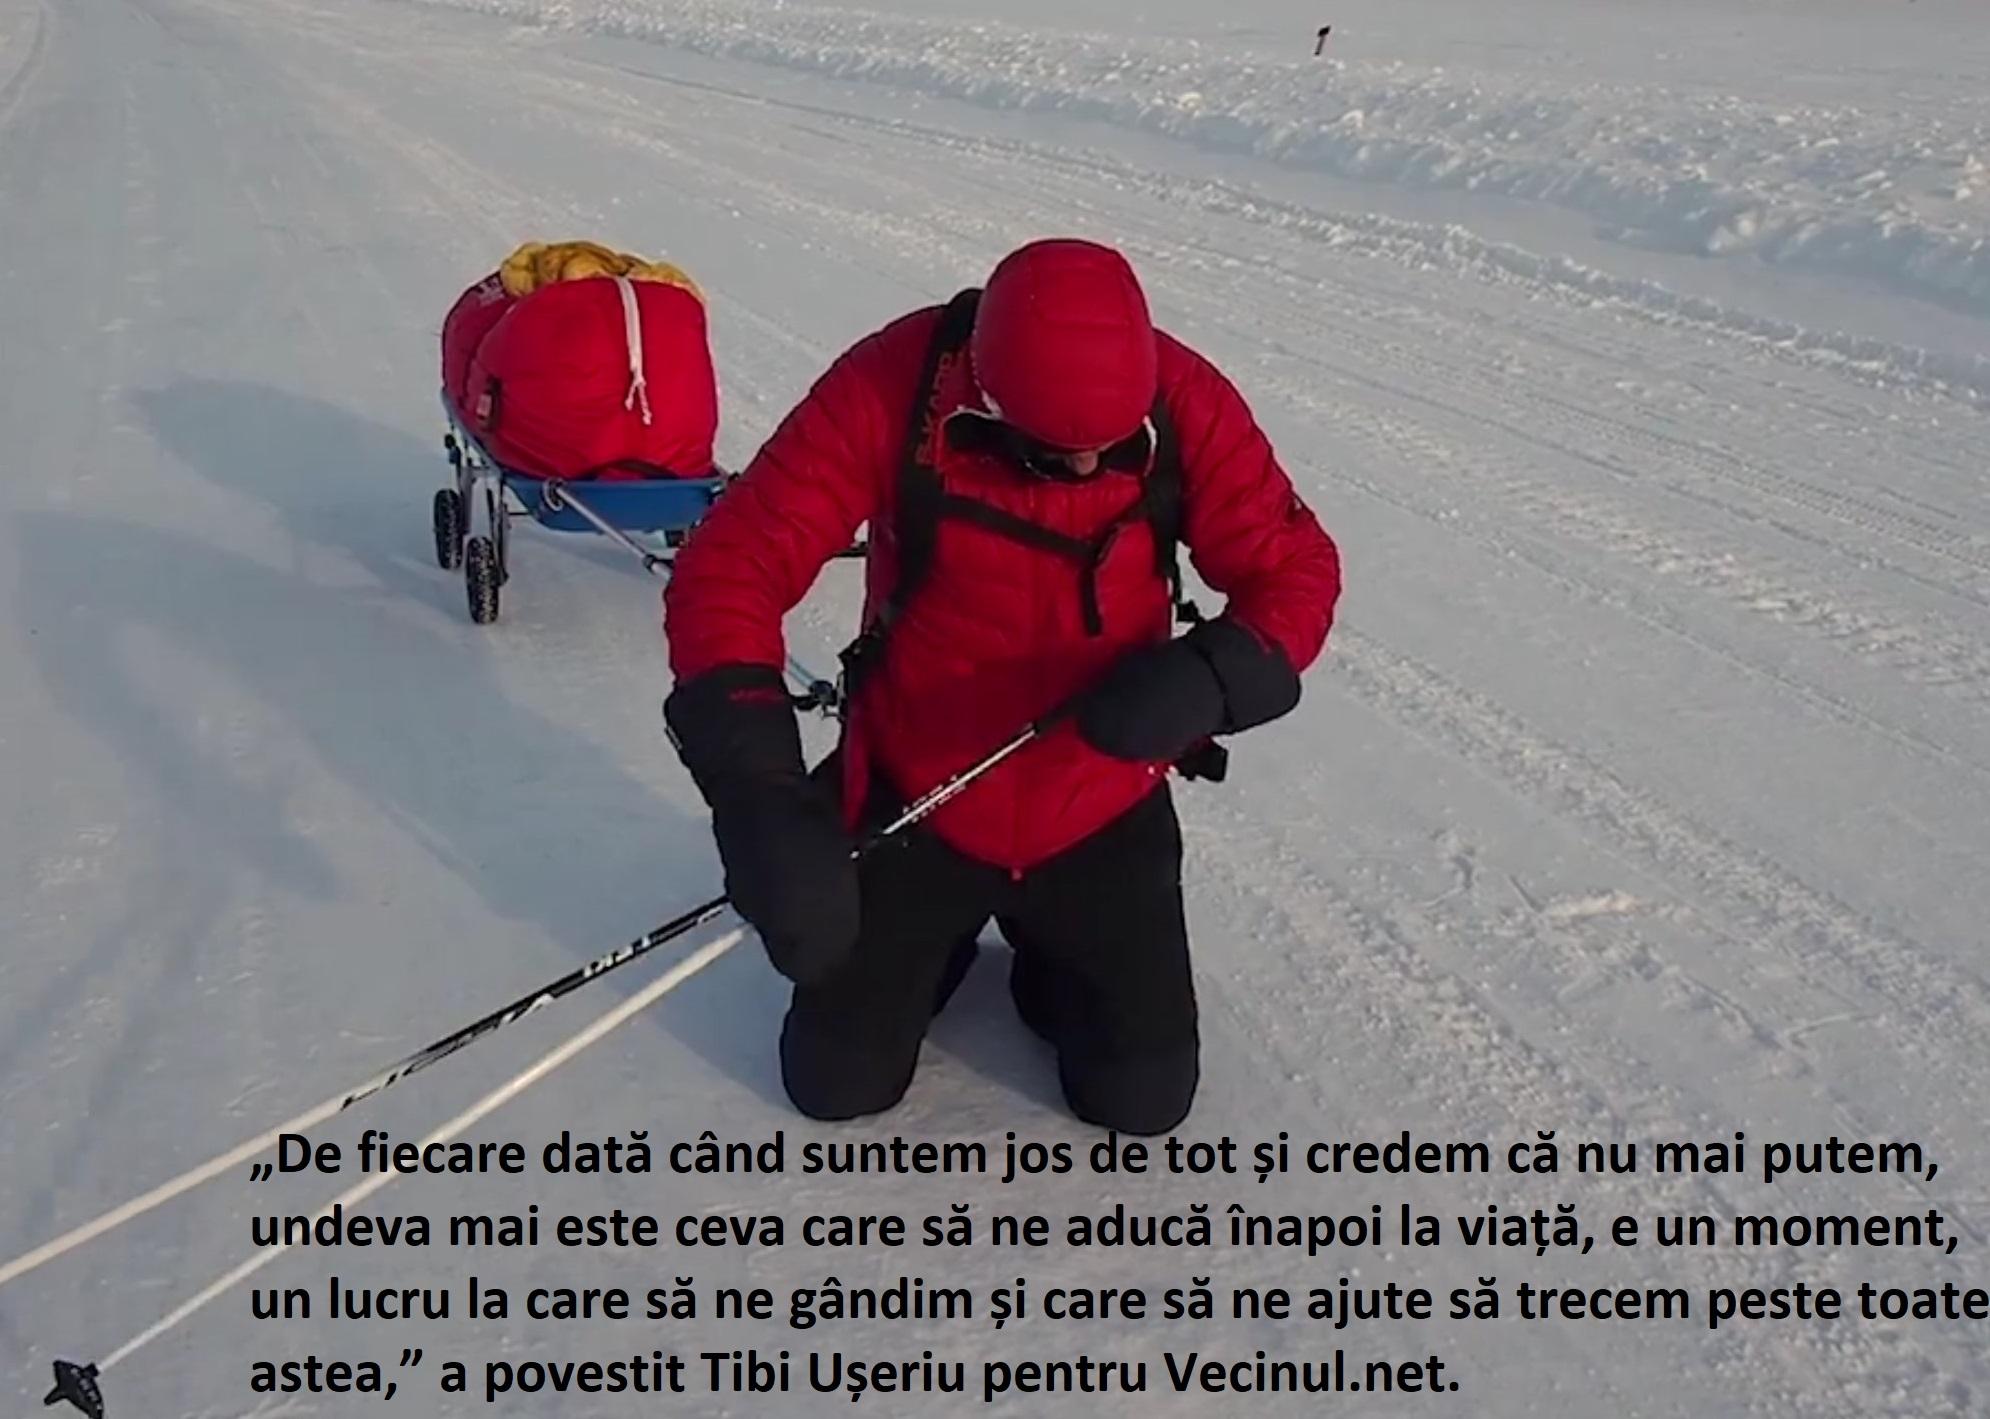 Tibi-useriu-in-ultimii-km